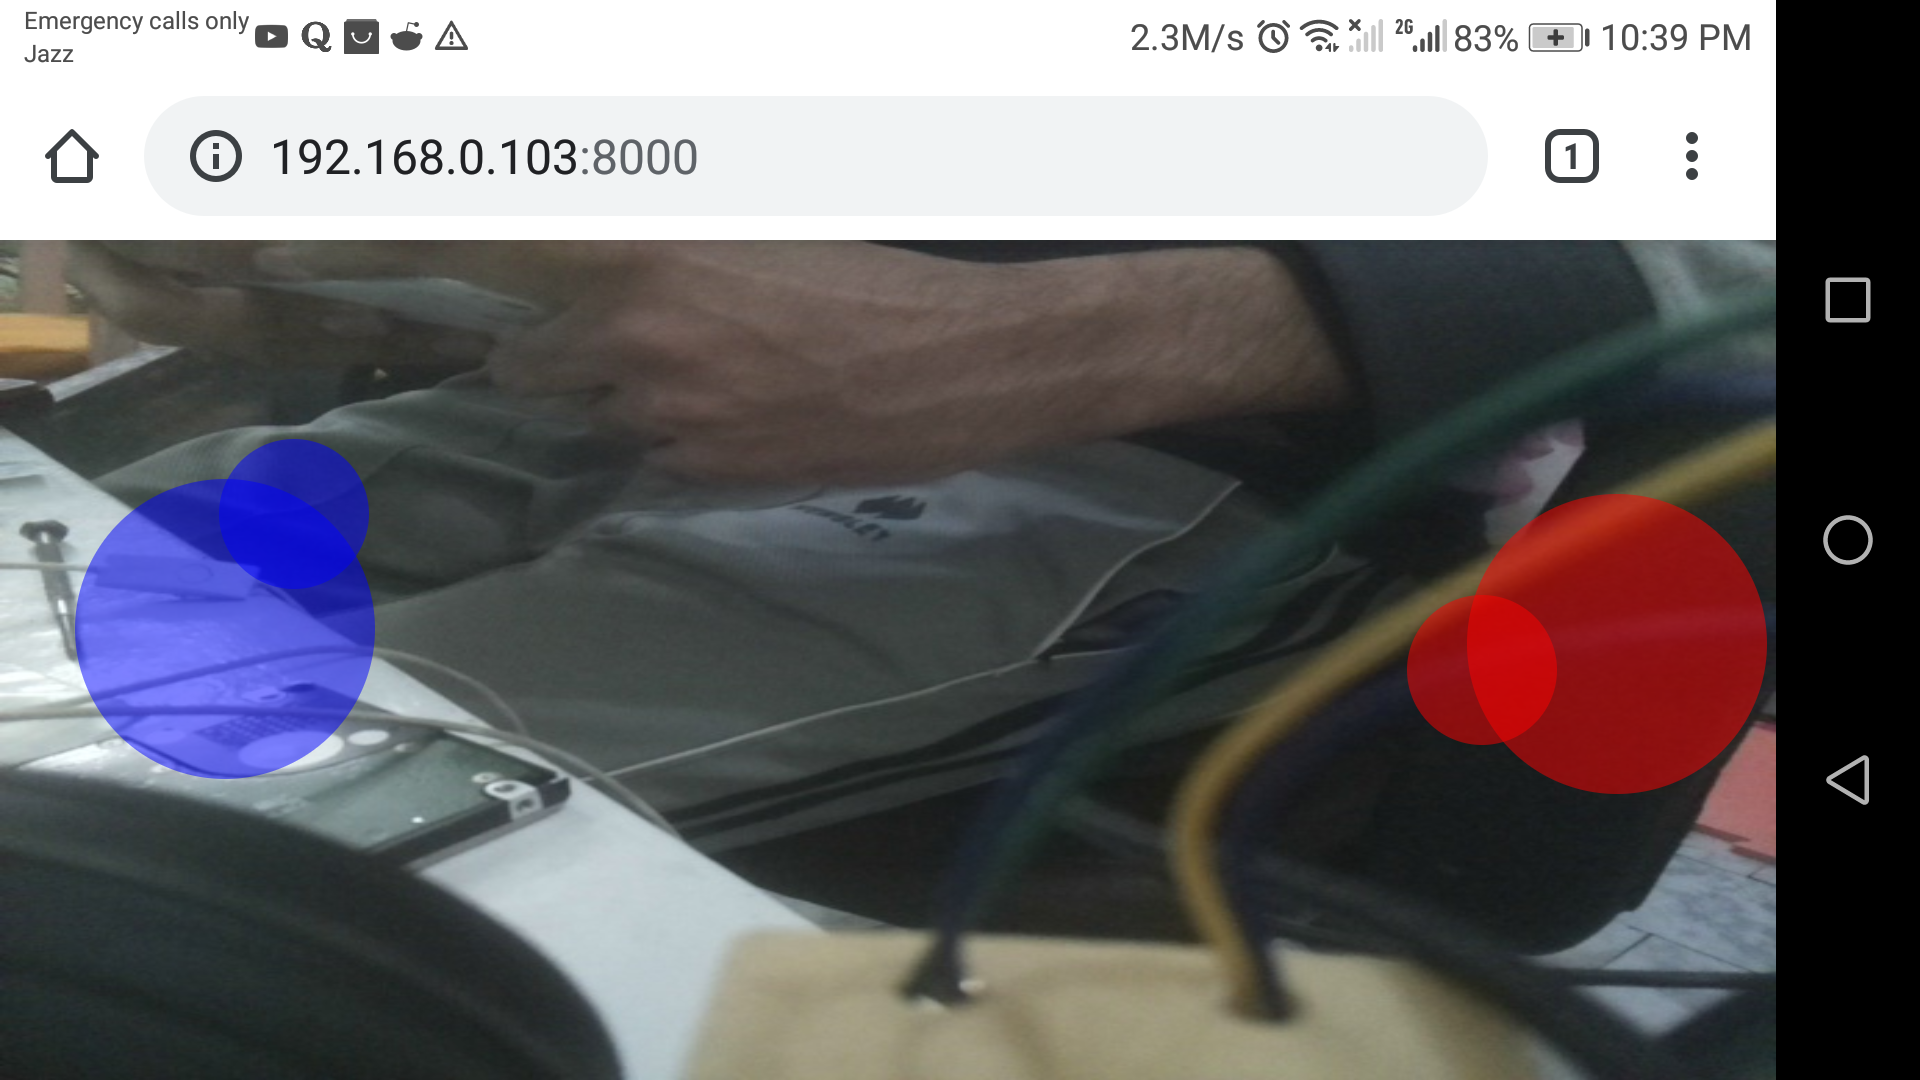 Wireless Video Surveillance Robot using Raspberry Pi 5.png